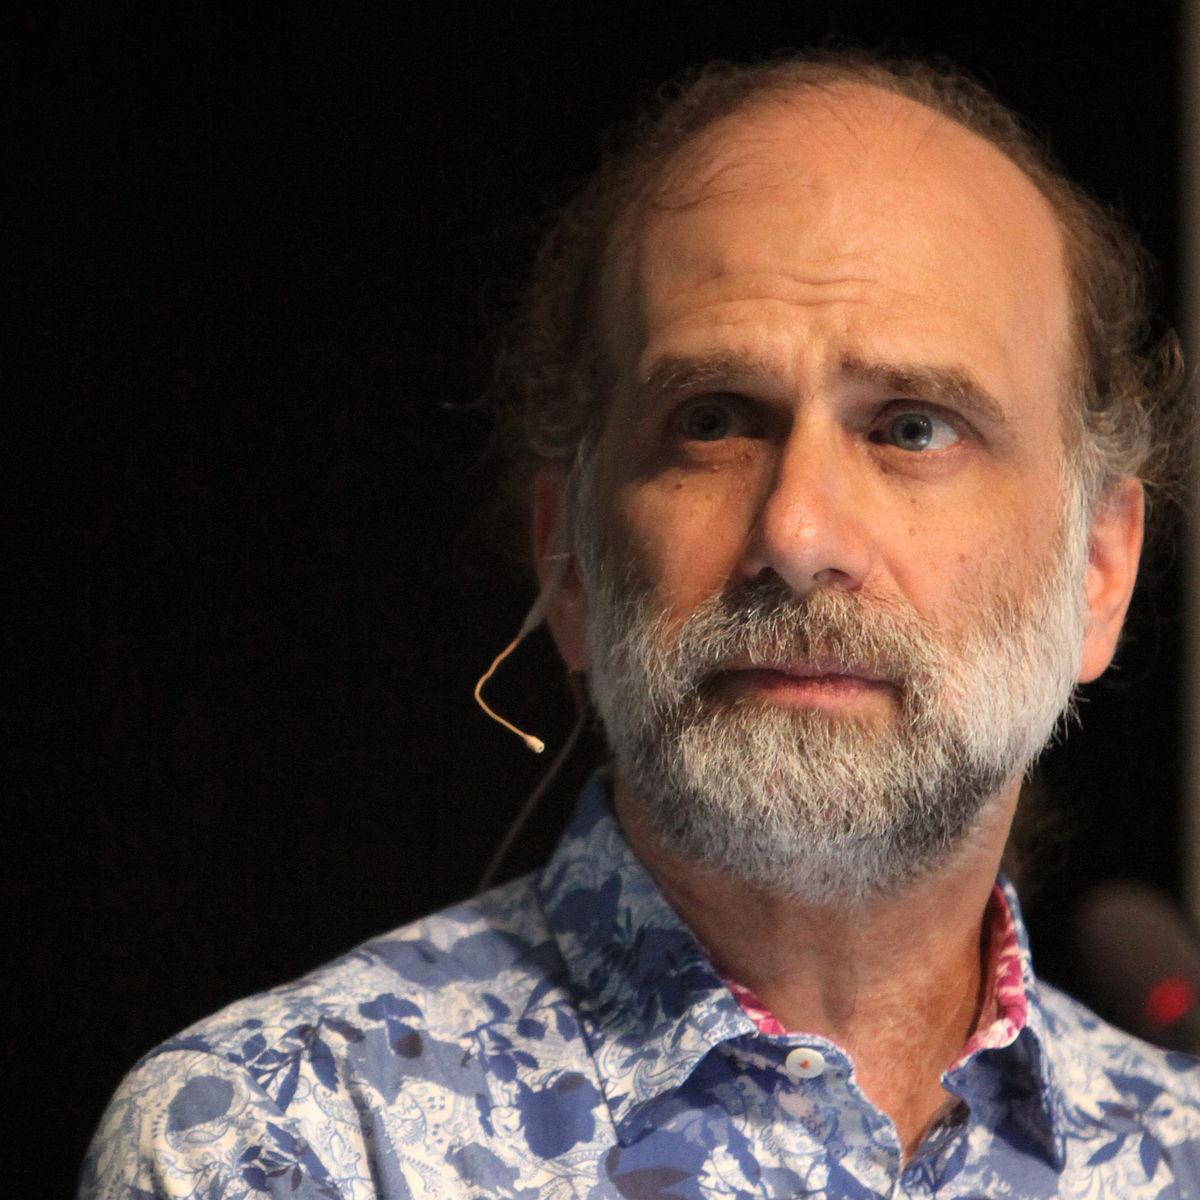 Free Internet Security >> Bruce Schneier - Wikipedia